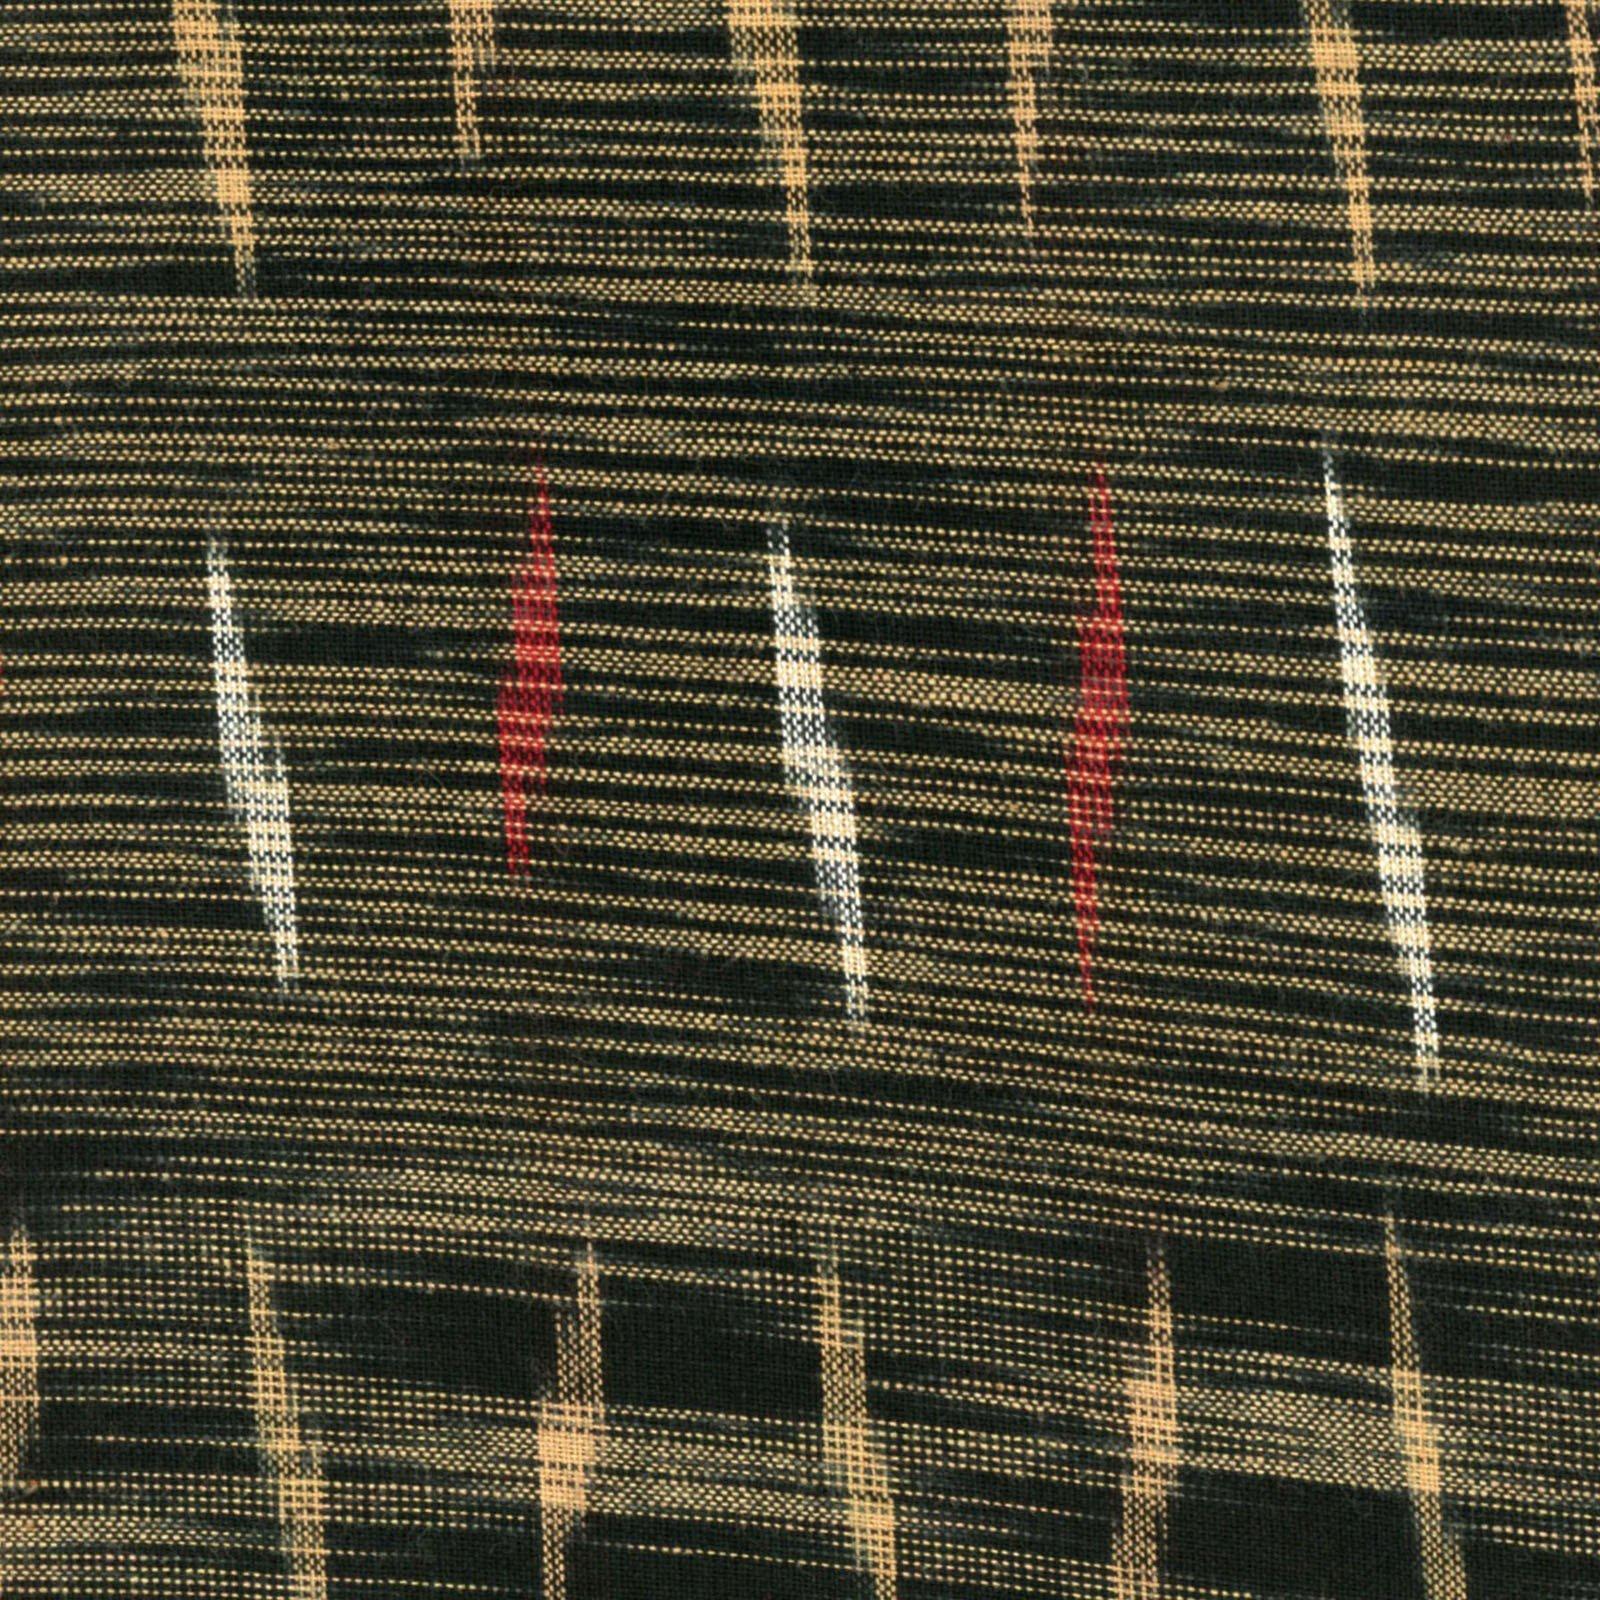 Textile Creations - Seminole - Lightning Bolt - Black/Khaki/Red/White